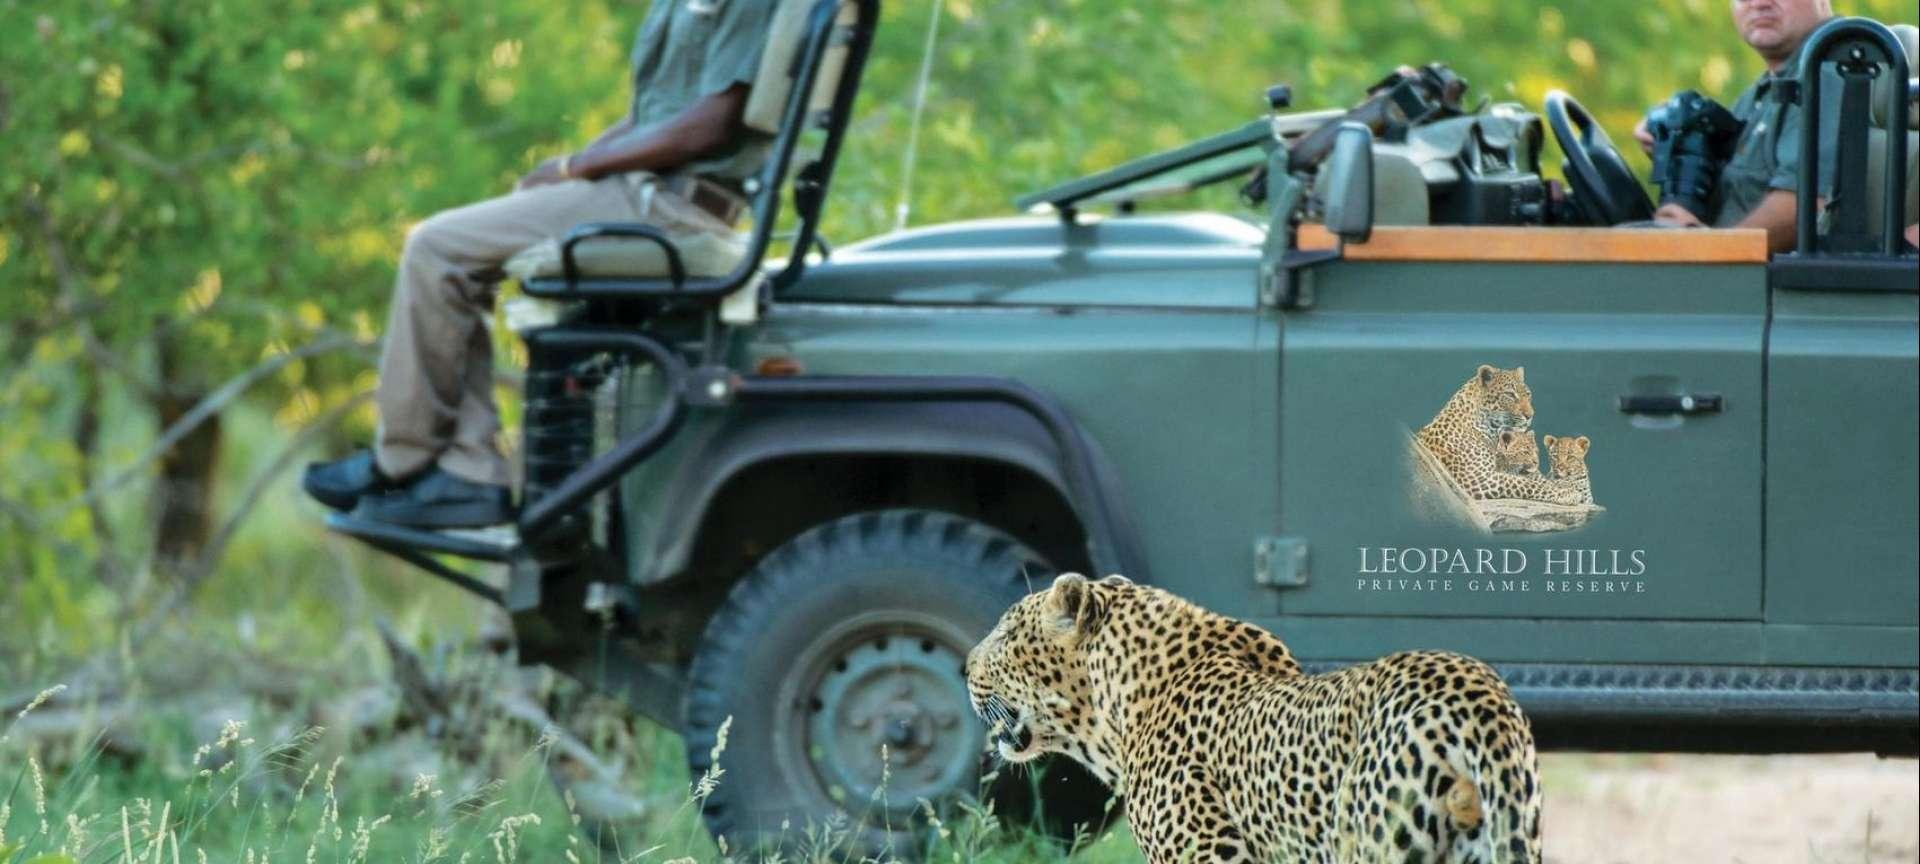 Luxury safaris in the Kruger - Africa Wildlife Safaris